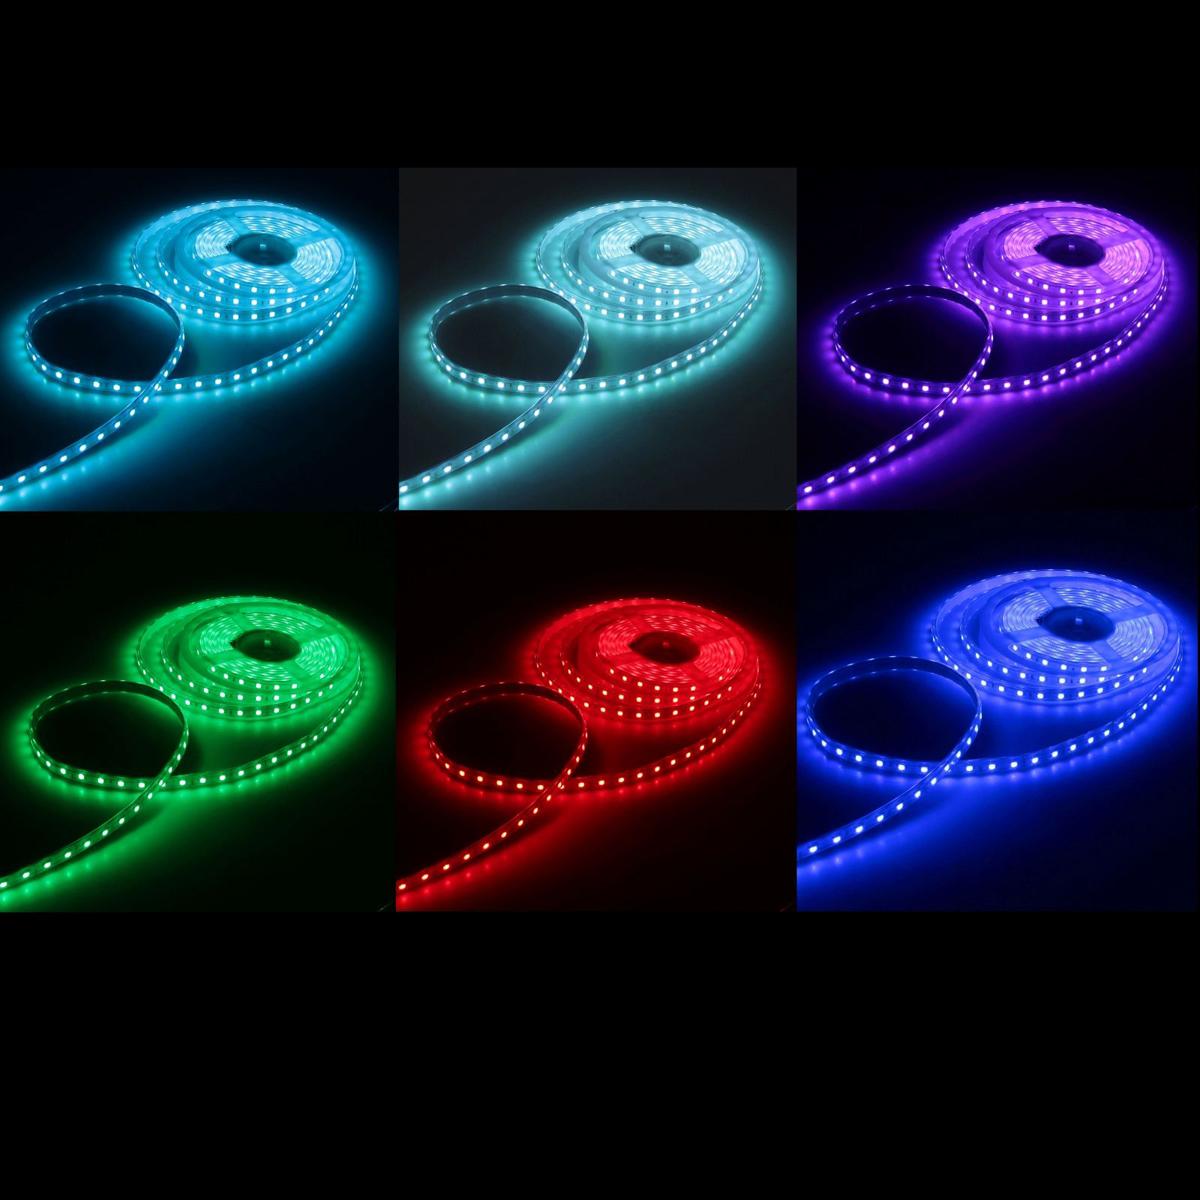 Светодиодная лента Luazon, 220В, SMD5050, длина 5 м, IP65, 60 LED ламп, 11 Вт/м,16-18 Лм/1 LED, AC, цвет: мультиколор ac 65 автостоп